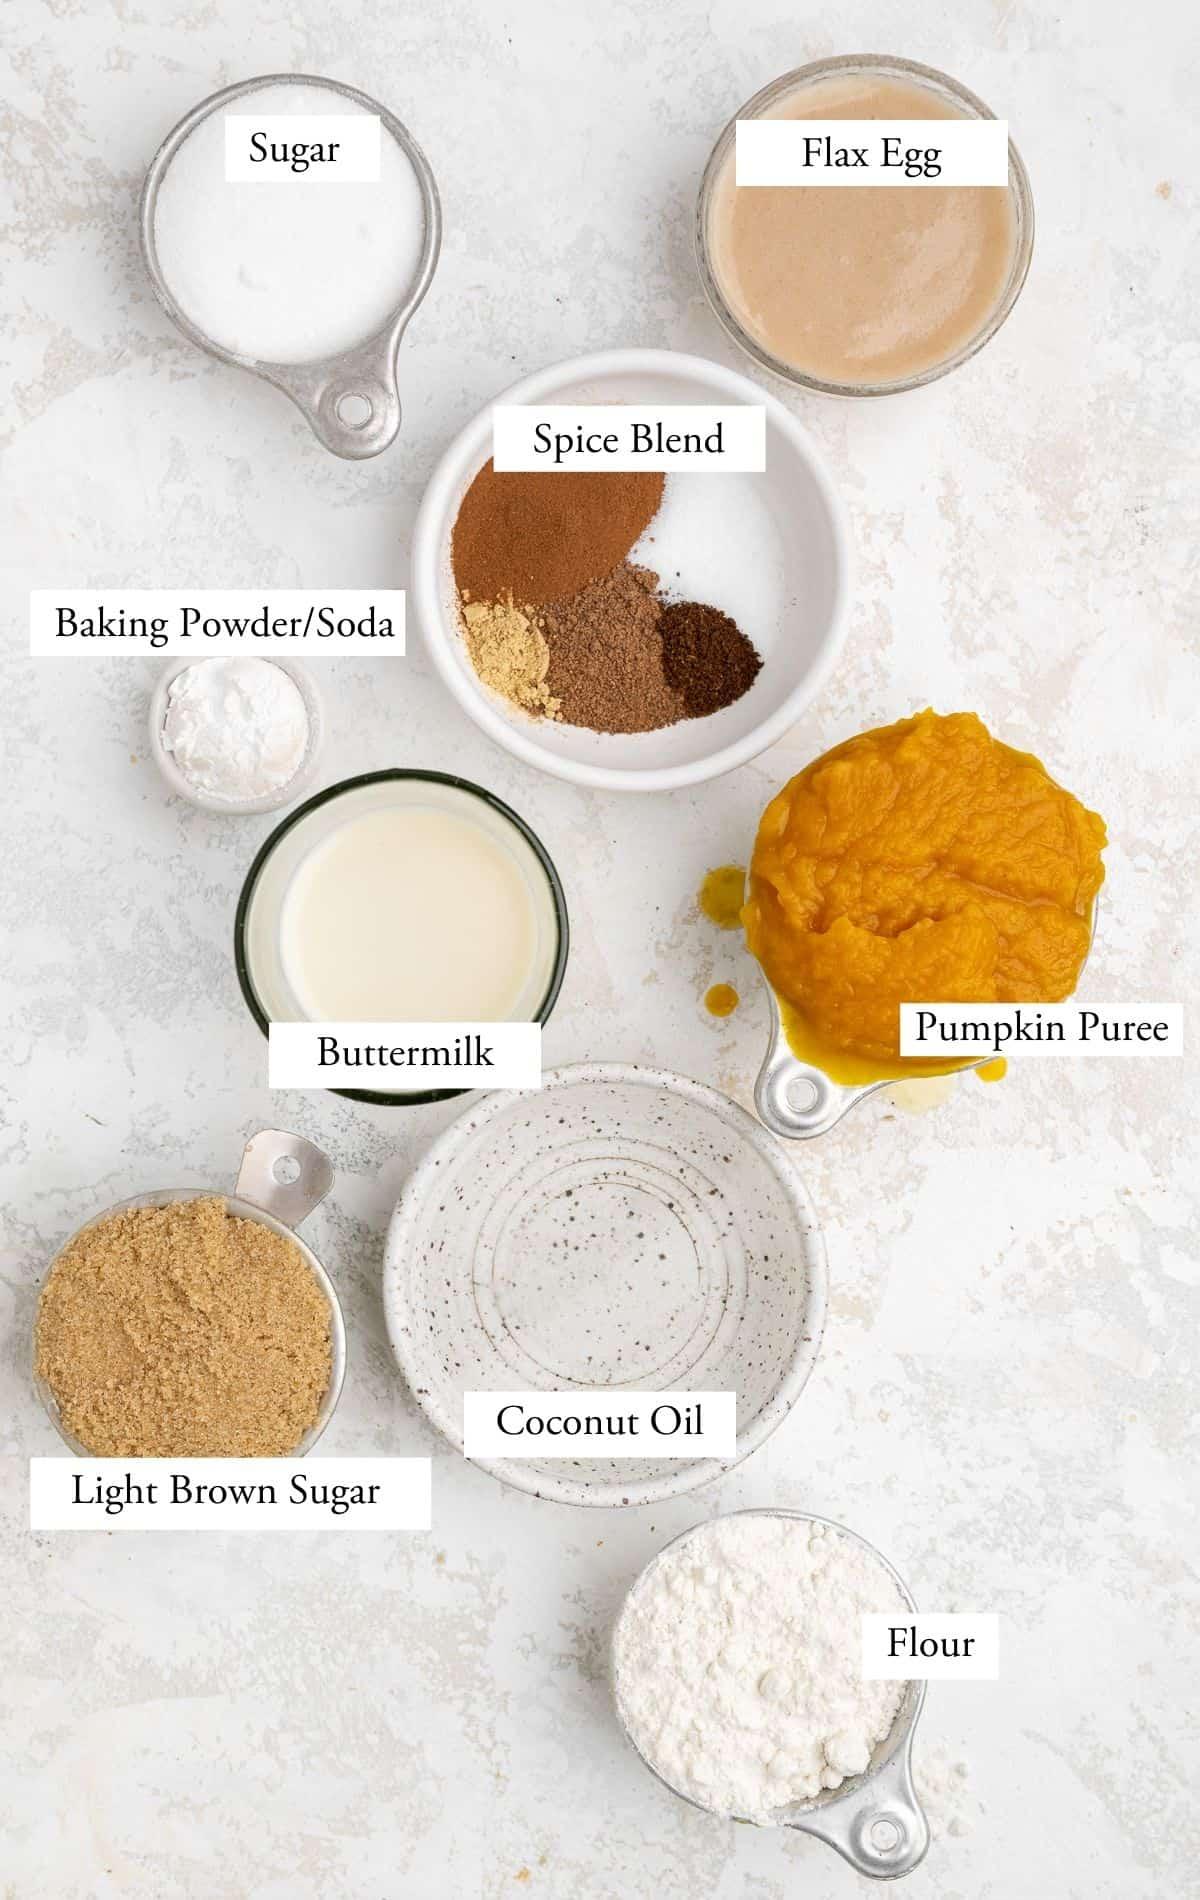 pumpkin coffee cake ingredients on a table: sugars, pumpkin puree, coconut oil, flour, baking powder, baking soda, buttermilk, flax eggs, spice blend.